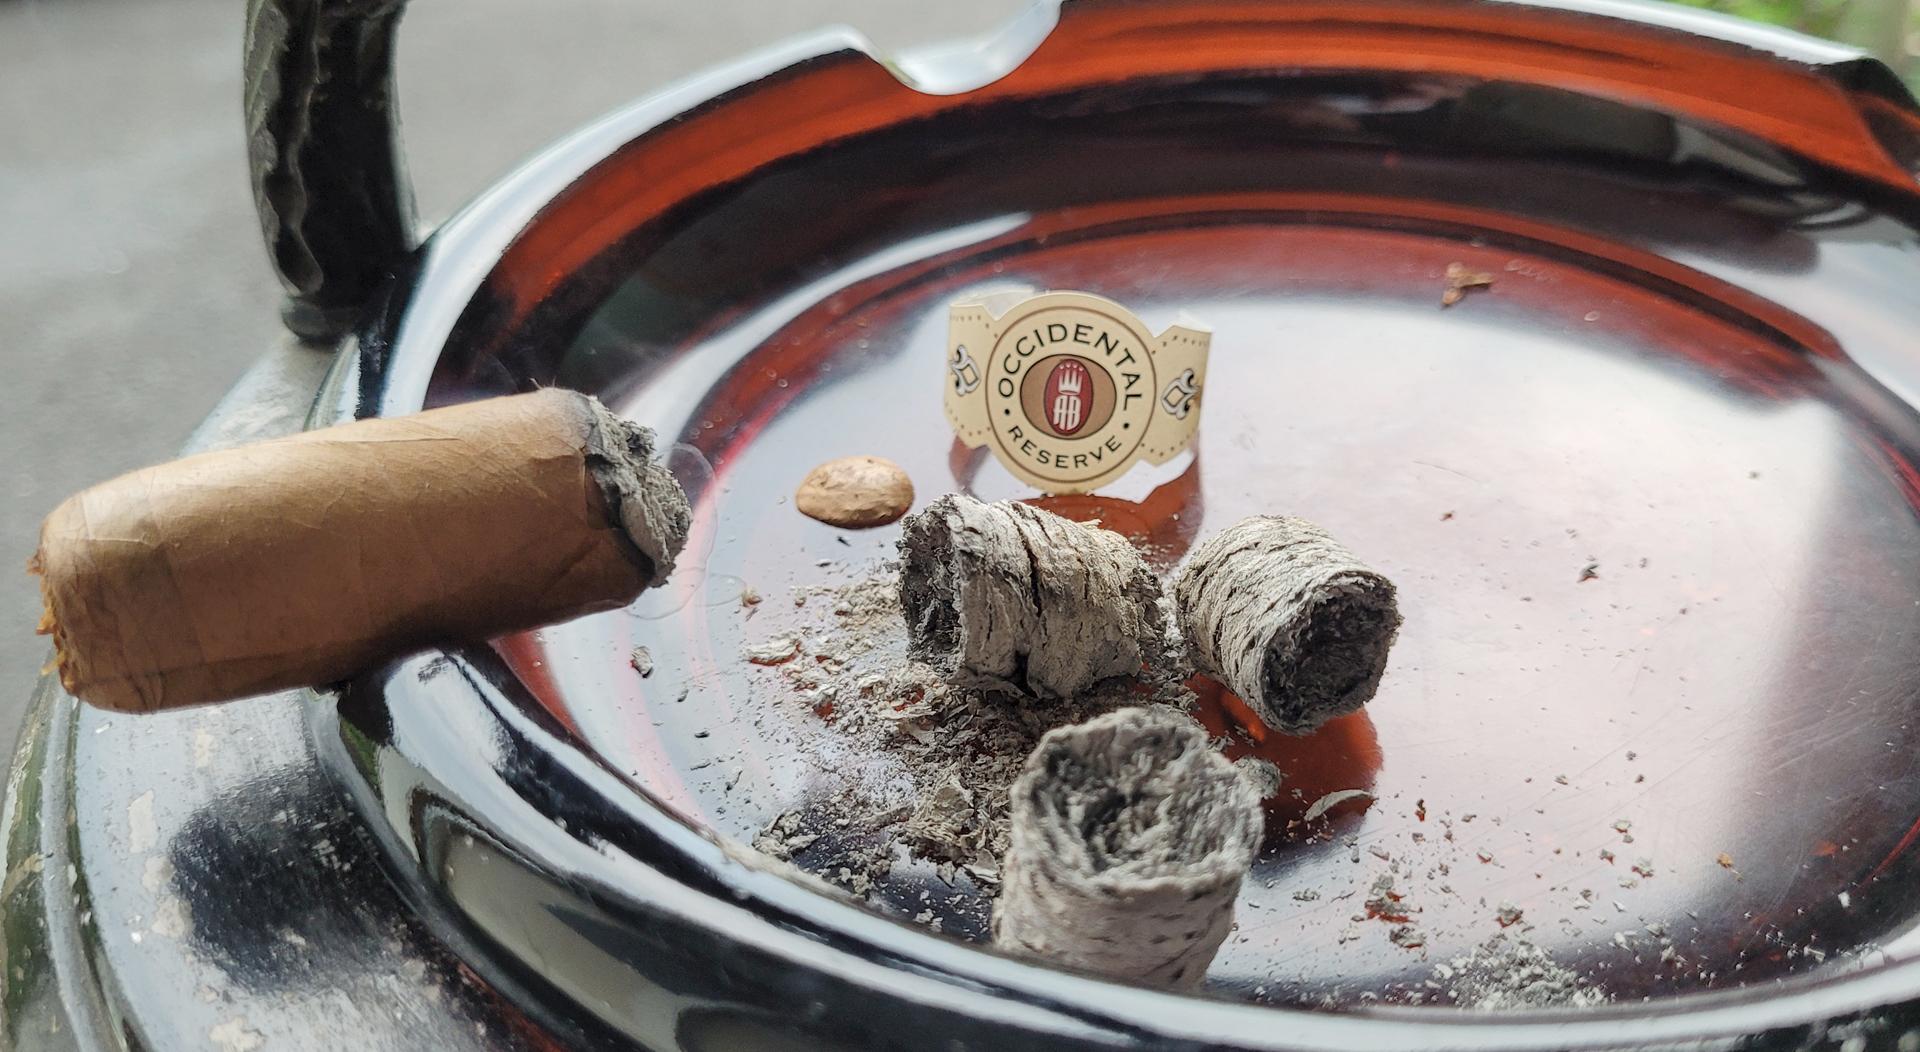 Alec Bradley Occidental Reserve Connecticut wrapper Robusto cigar cigar in ashtray